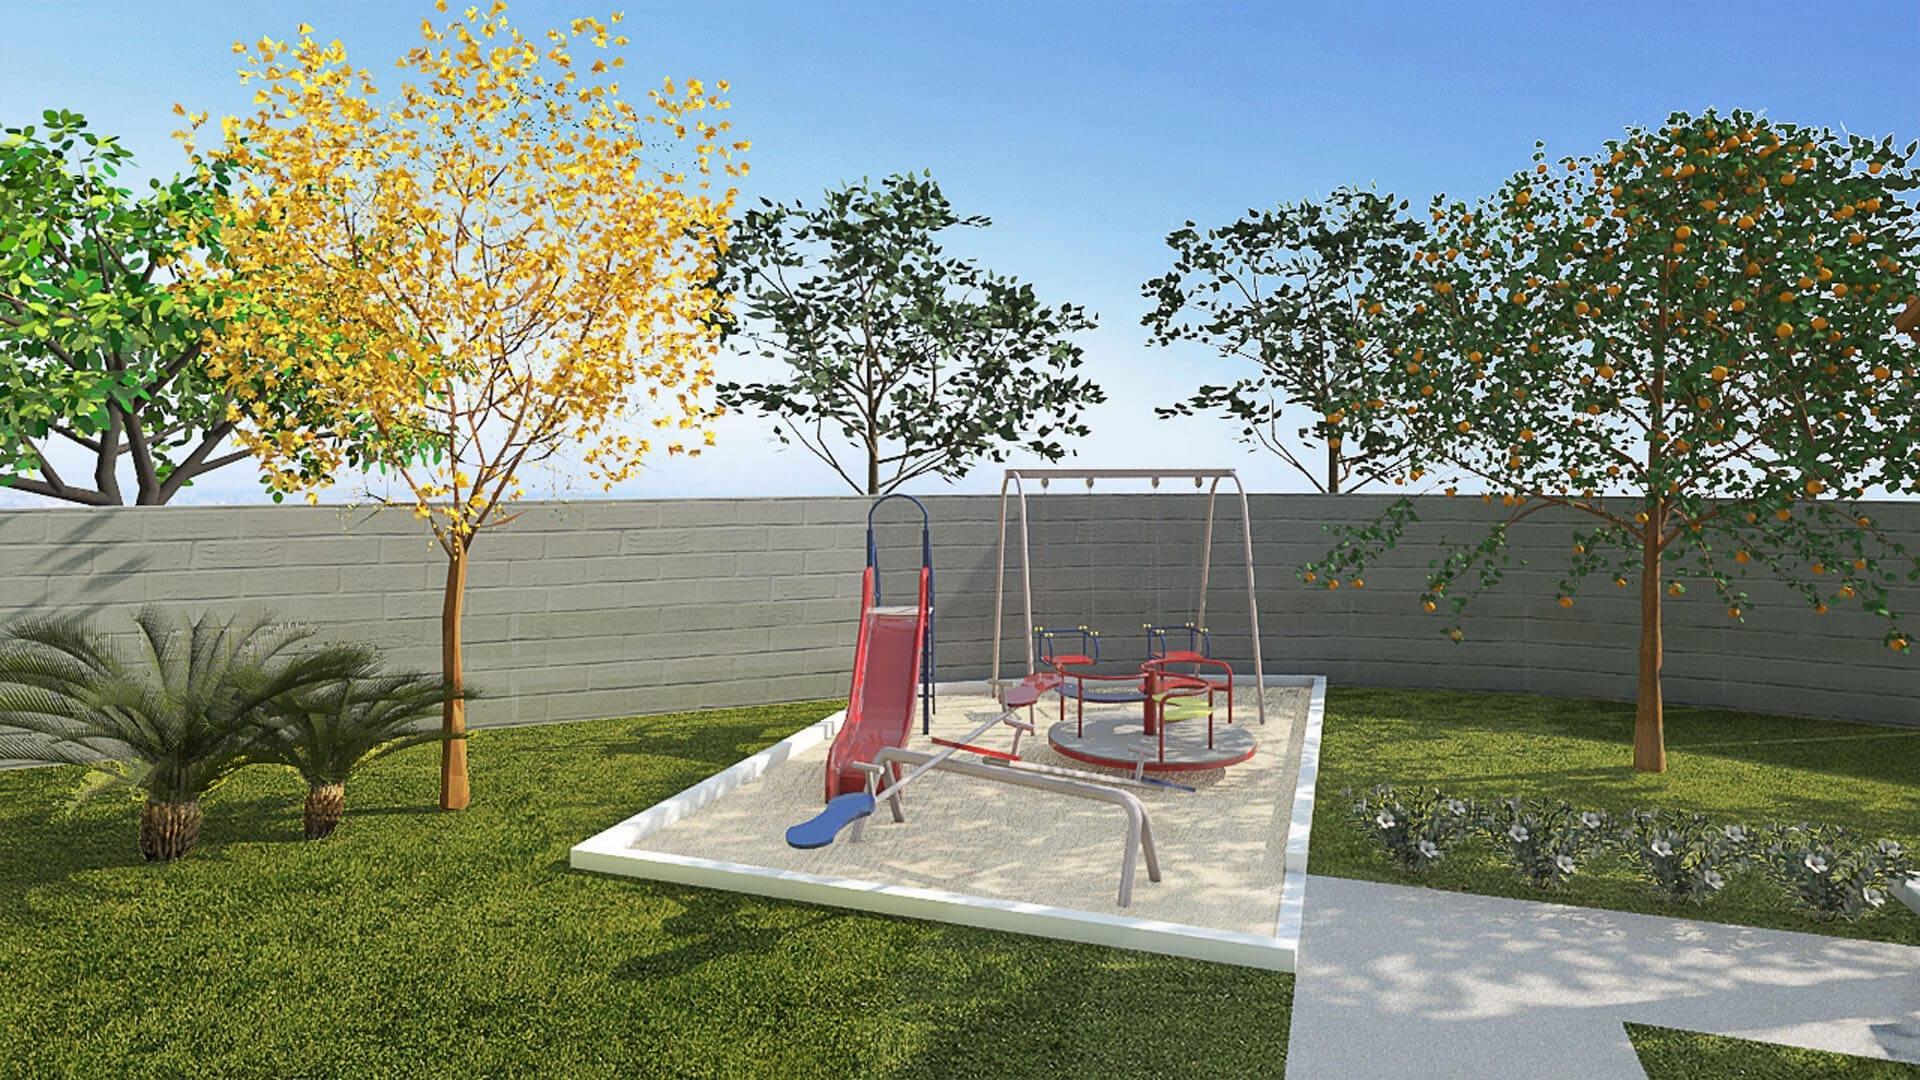 vic-engenharia-ville-park-torino-playground